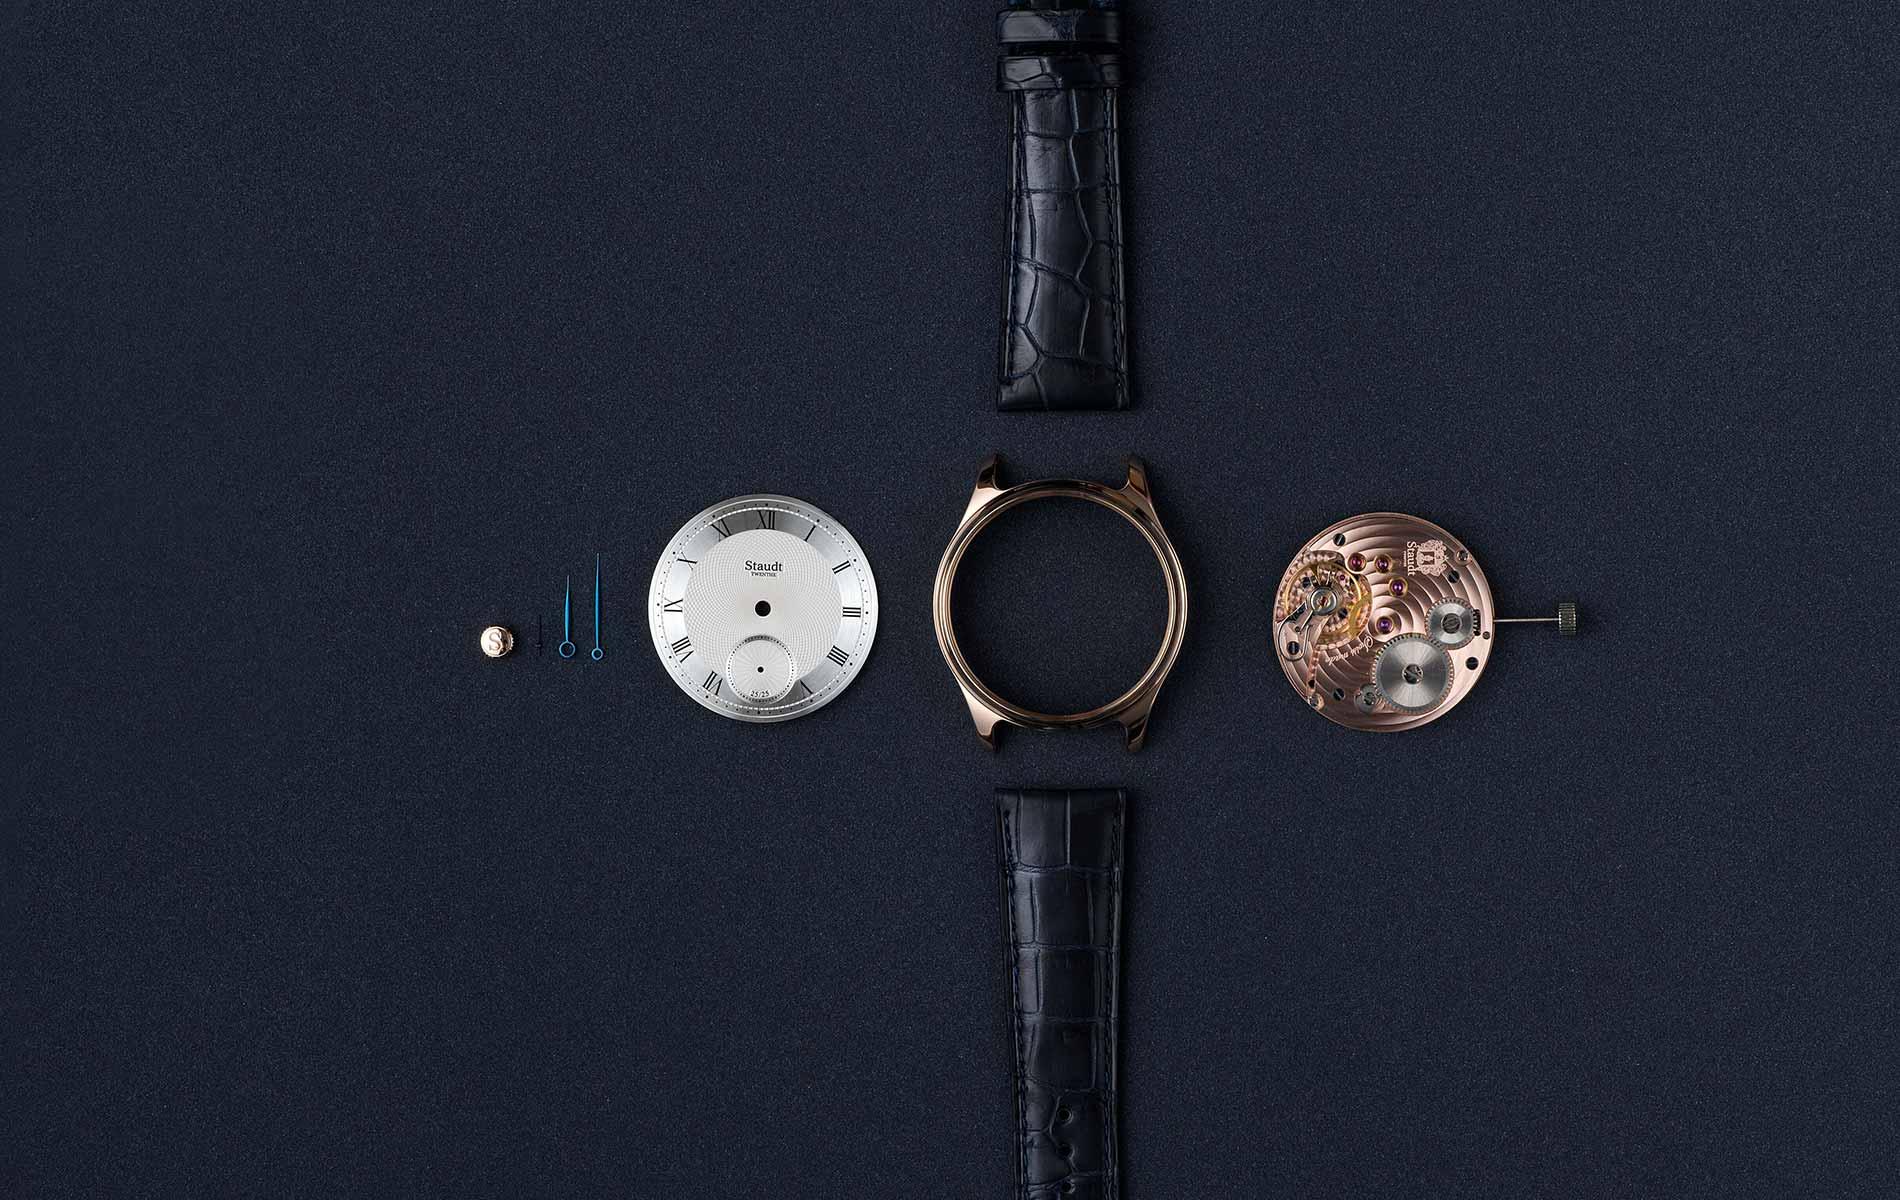 Staudt Twenthe Watches